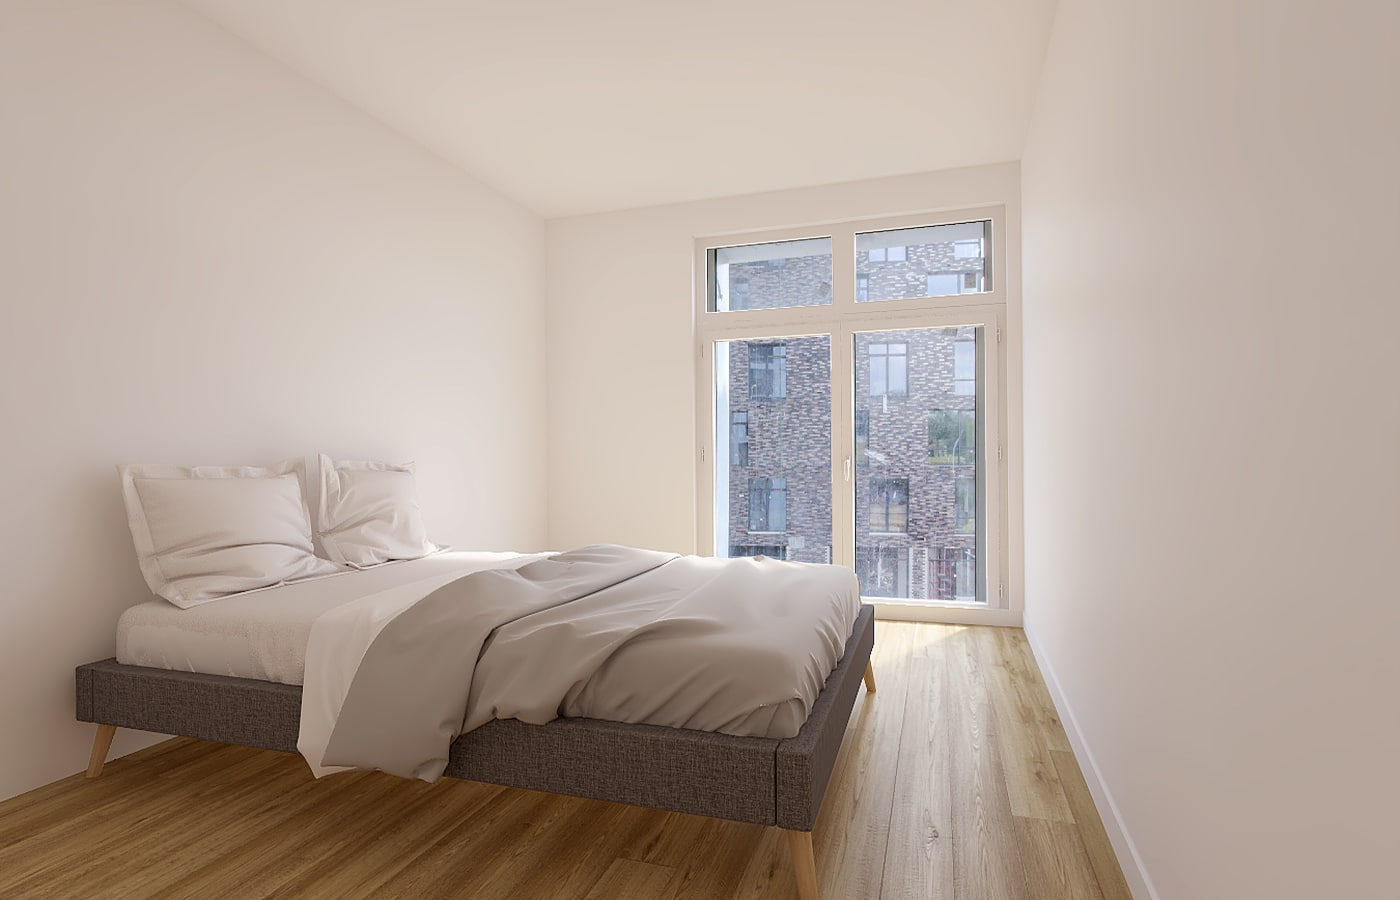 agencement lit petite chambre